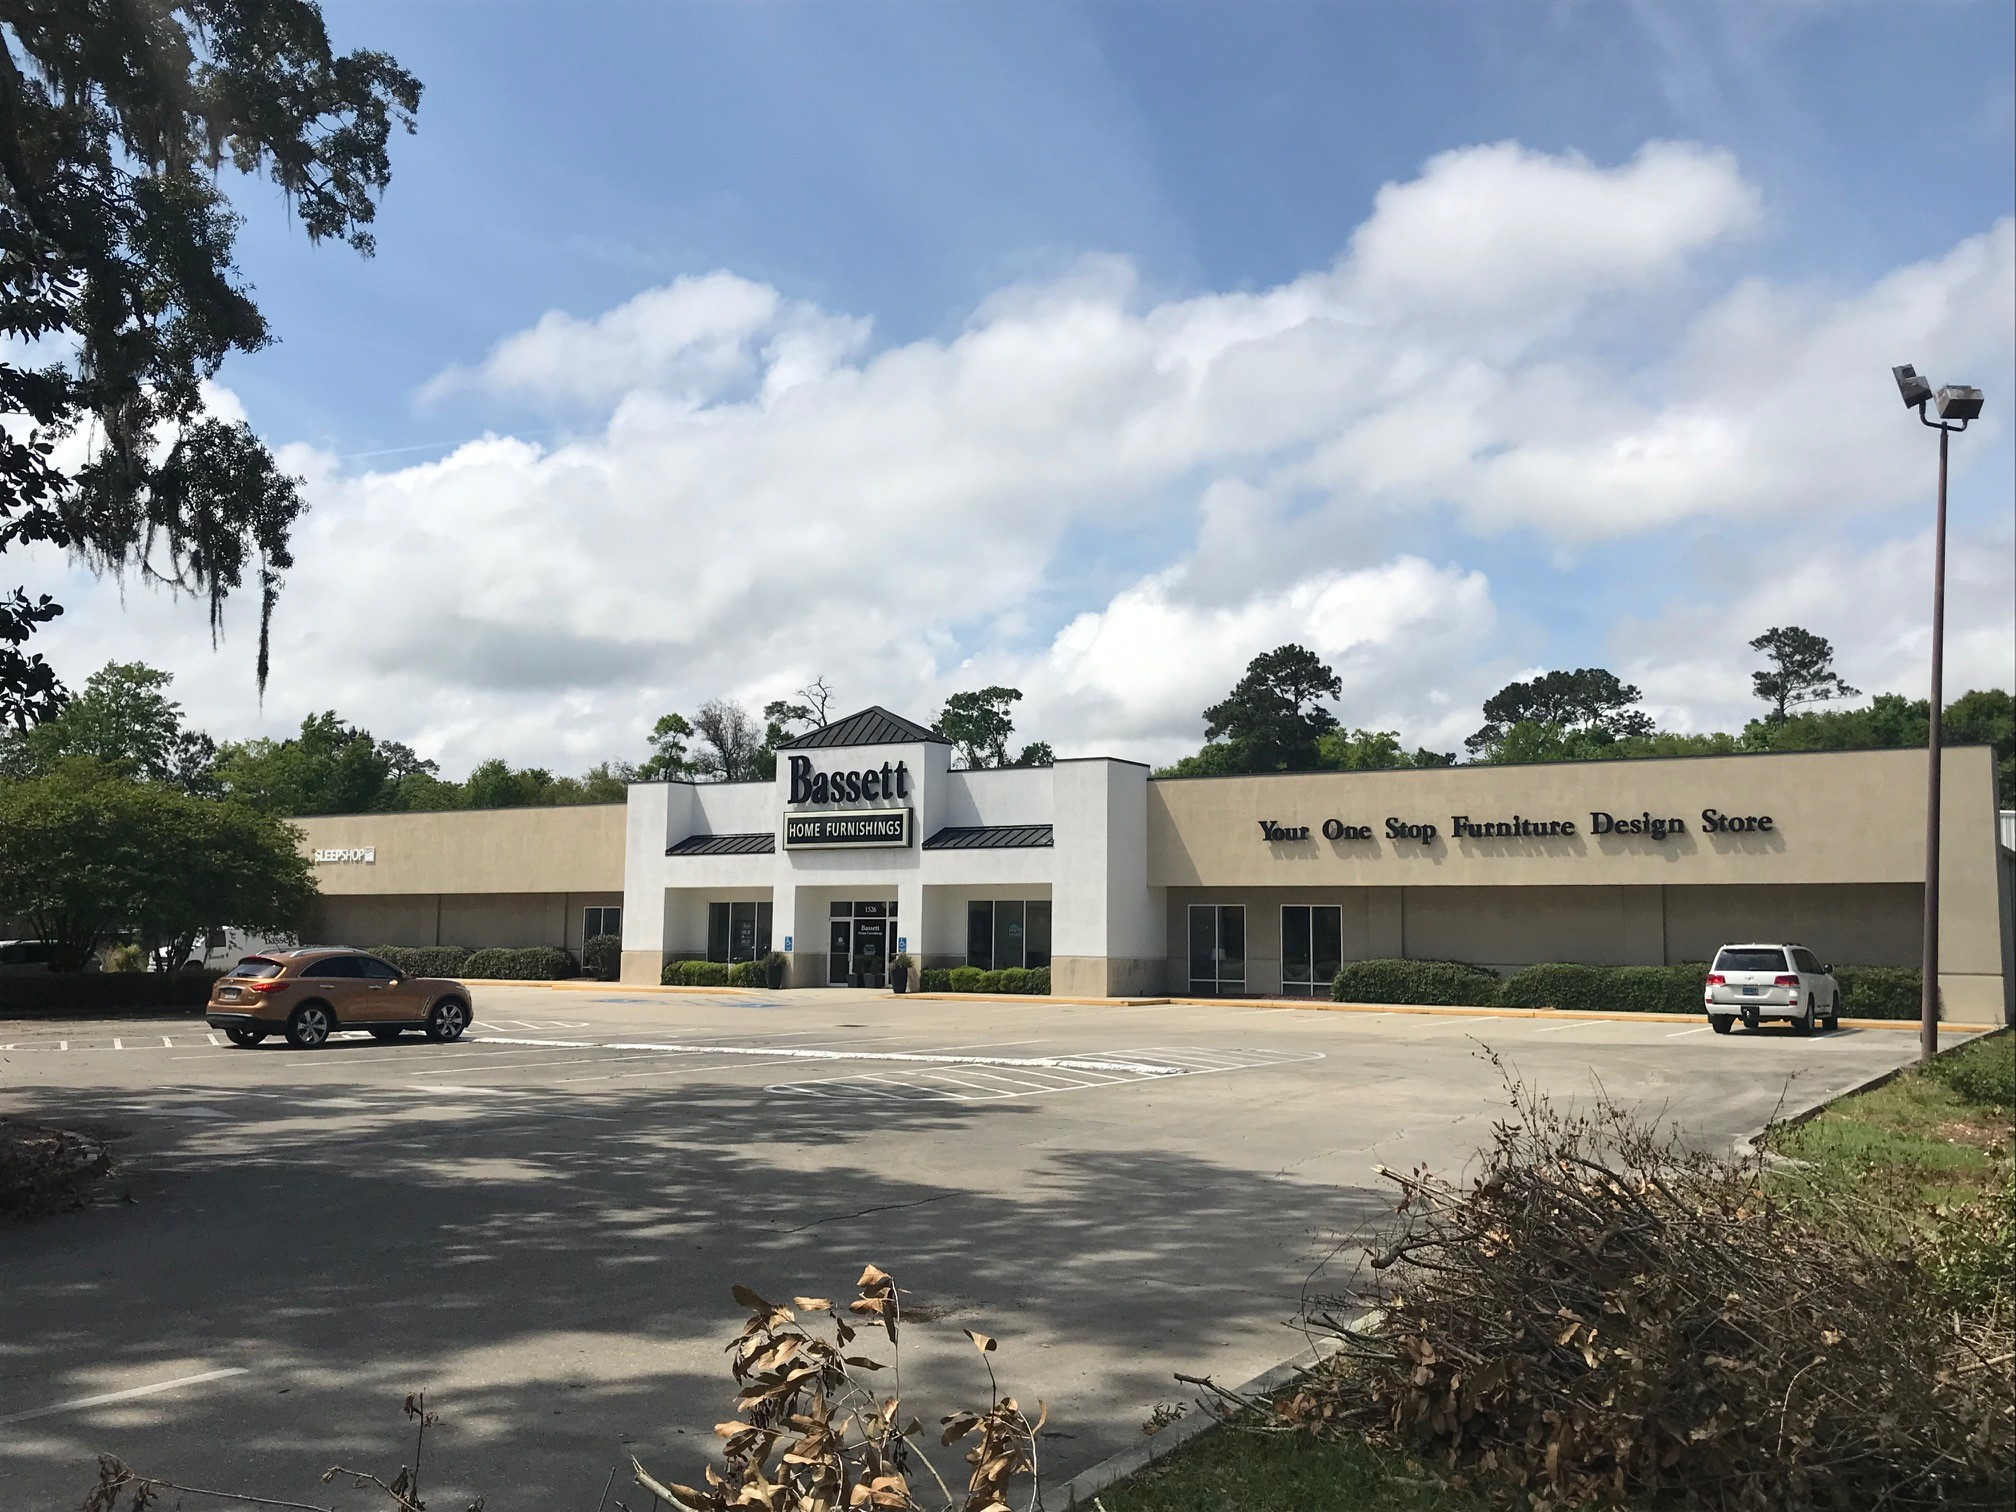 Former Bassett Home Furnishings Building in Gulfport, MS